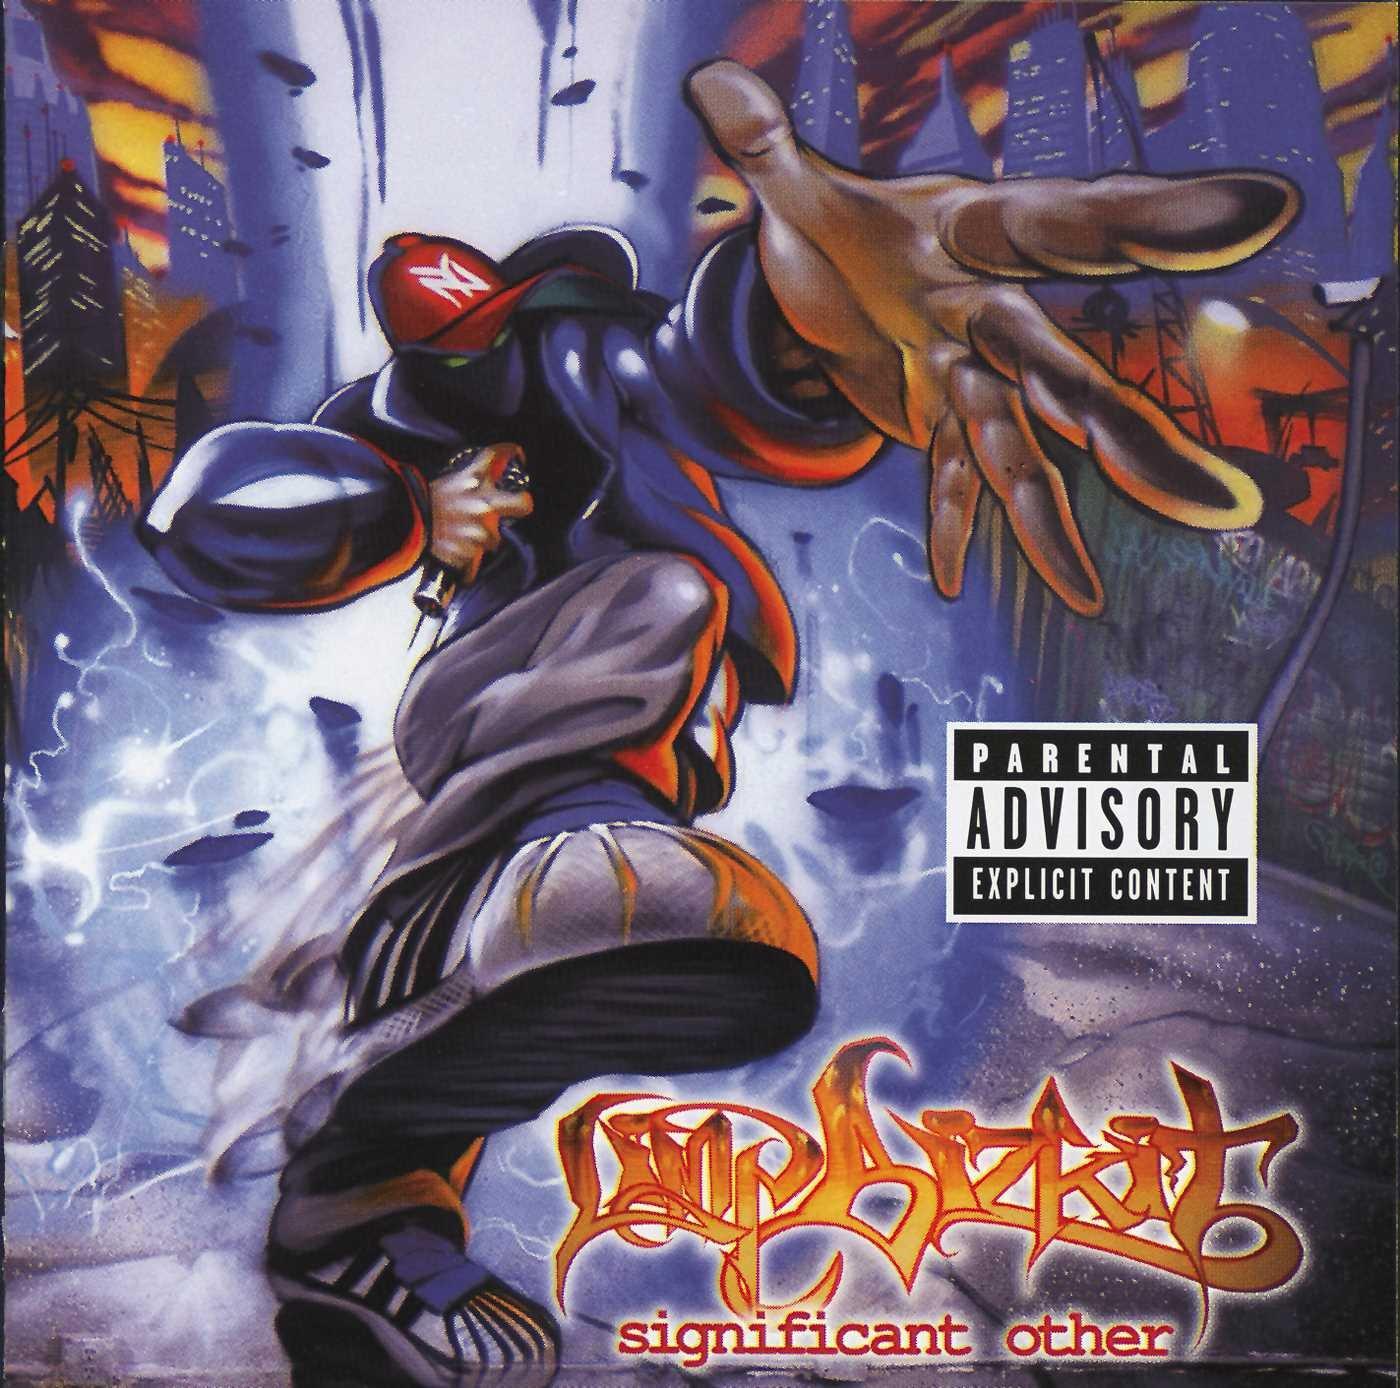 CD : Limp Bizkit - Significant Other [Explicit Content] (Enhanced)